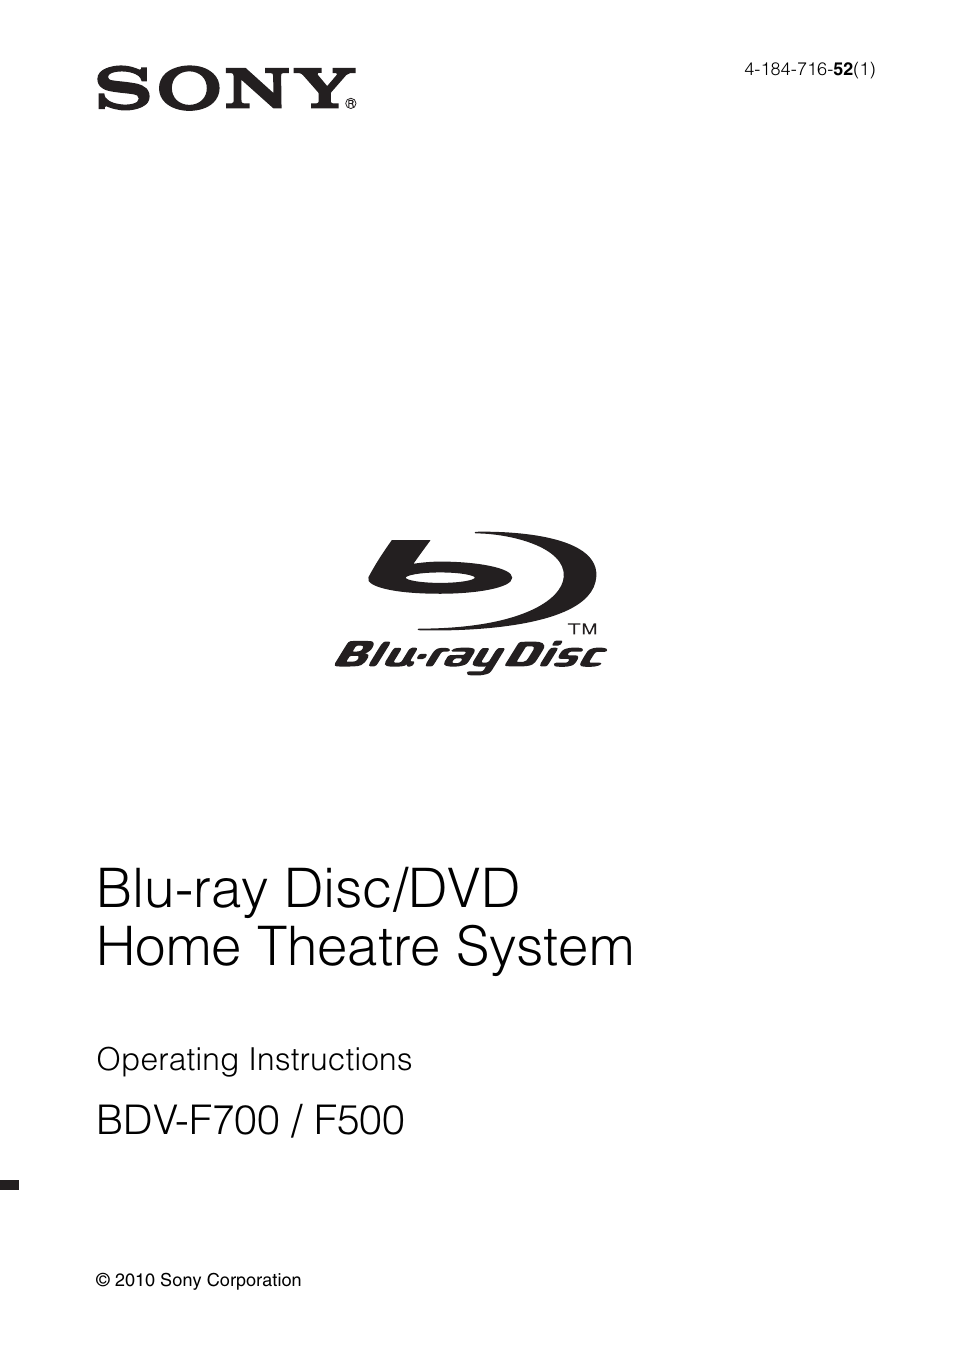 Sony hcd-f500 sm service manual download, schematics, eeprom.